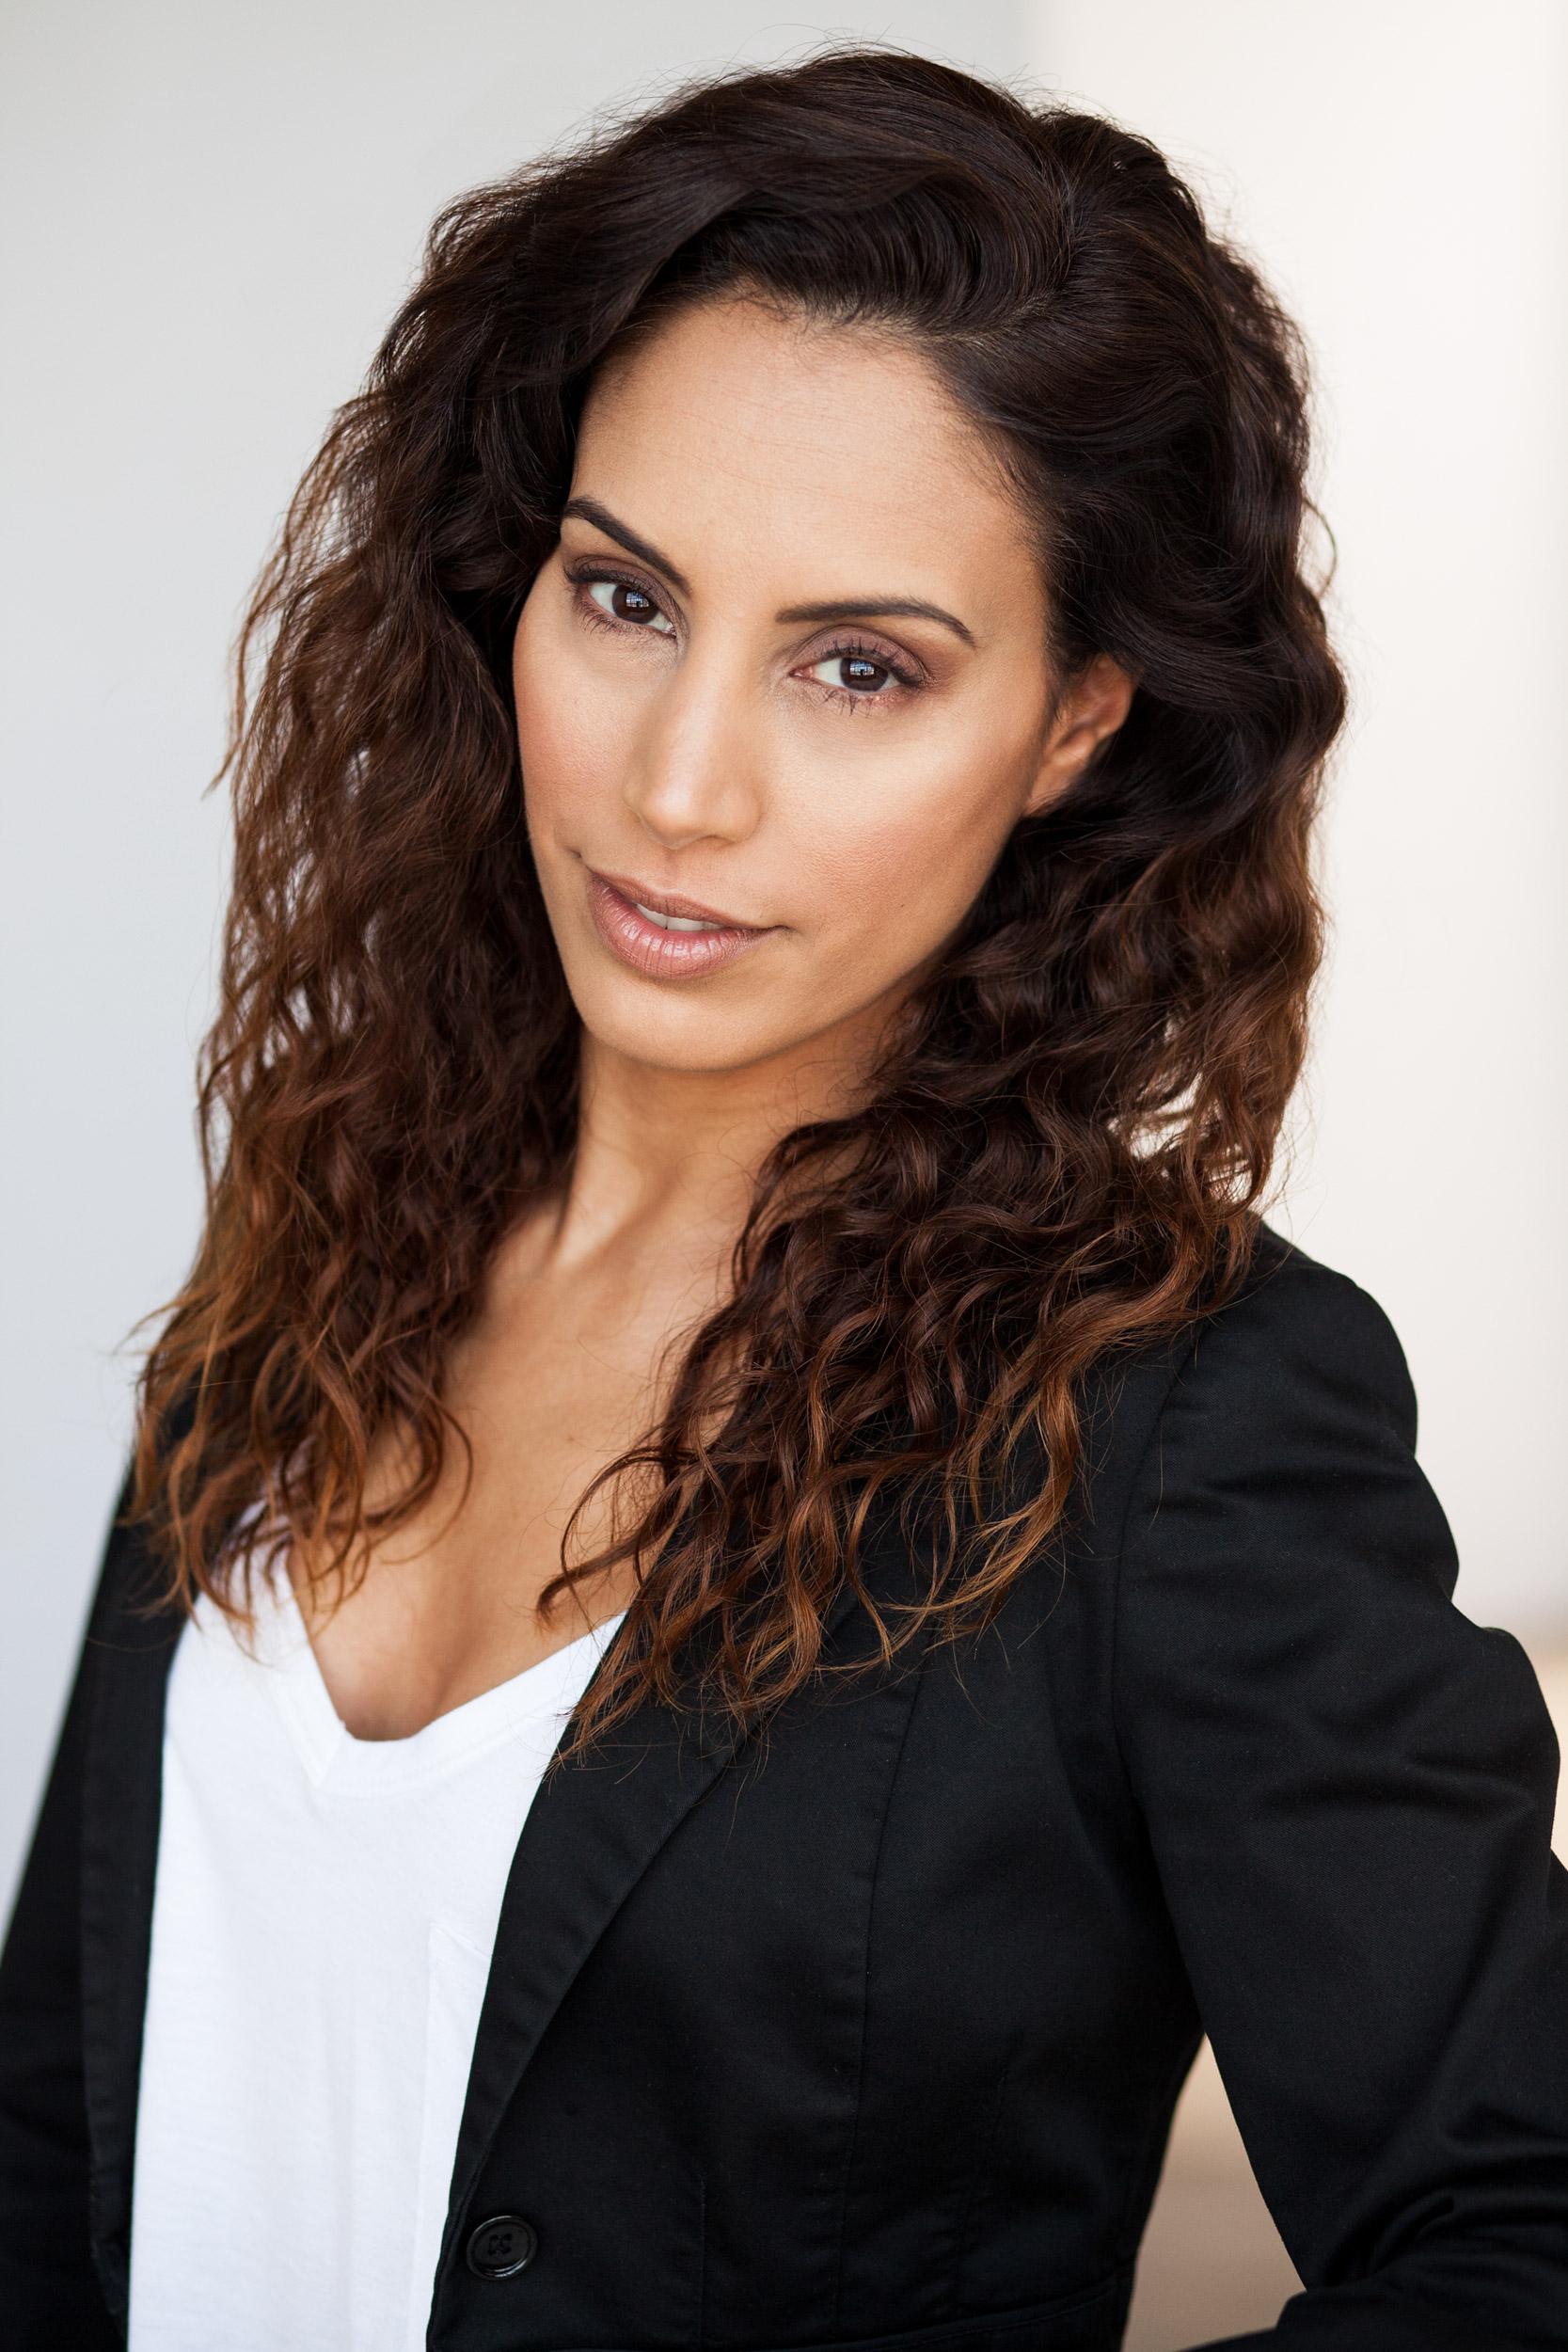 Keren_Ashri_actress_brunette.jpg